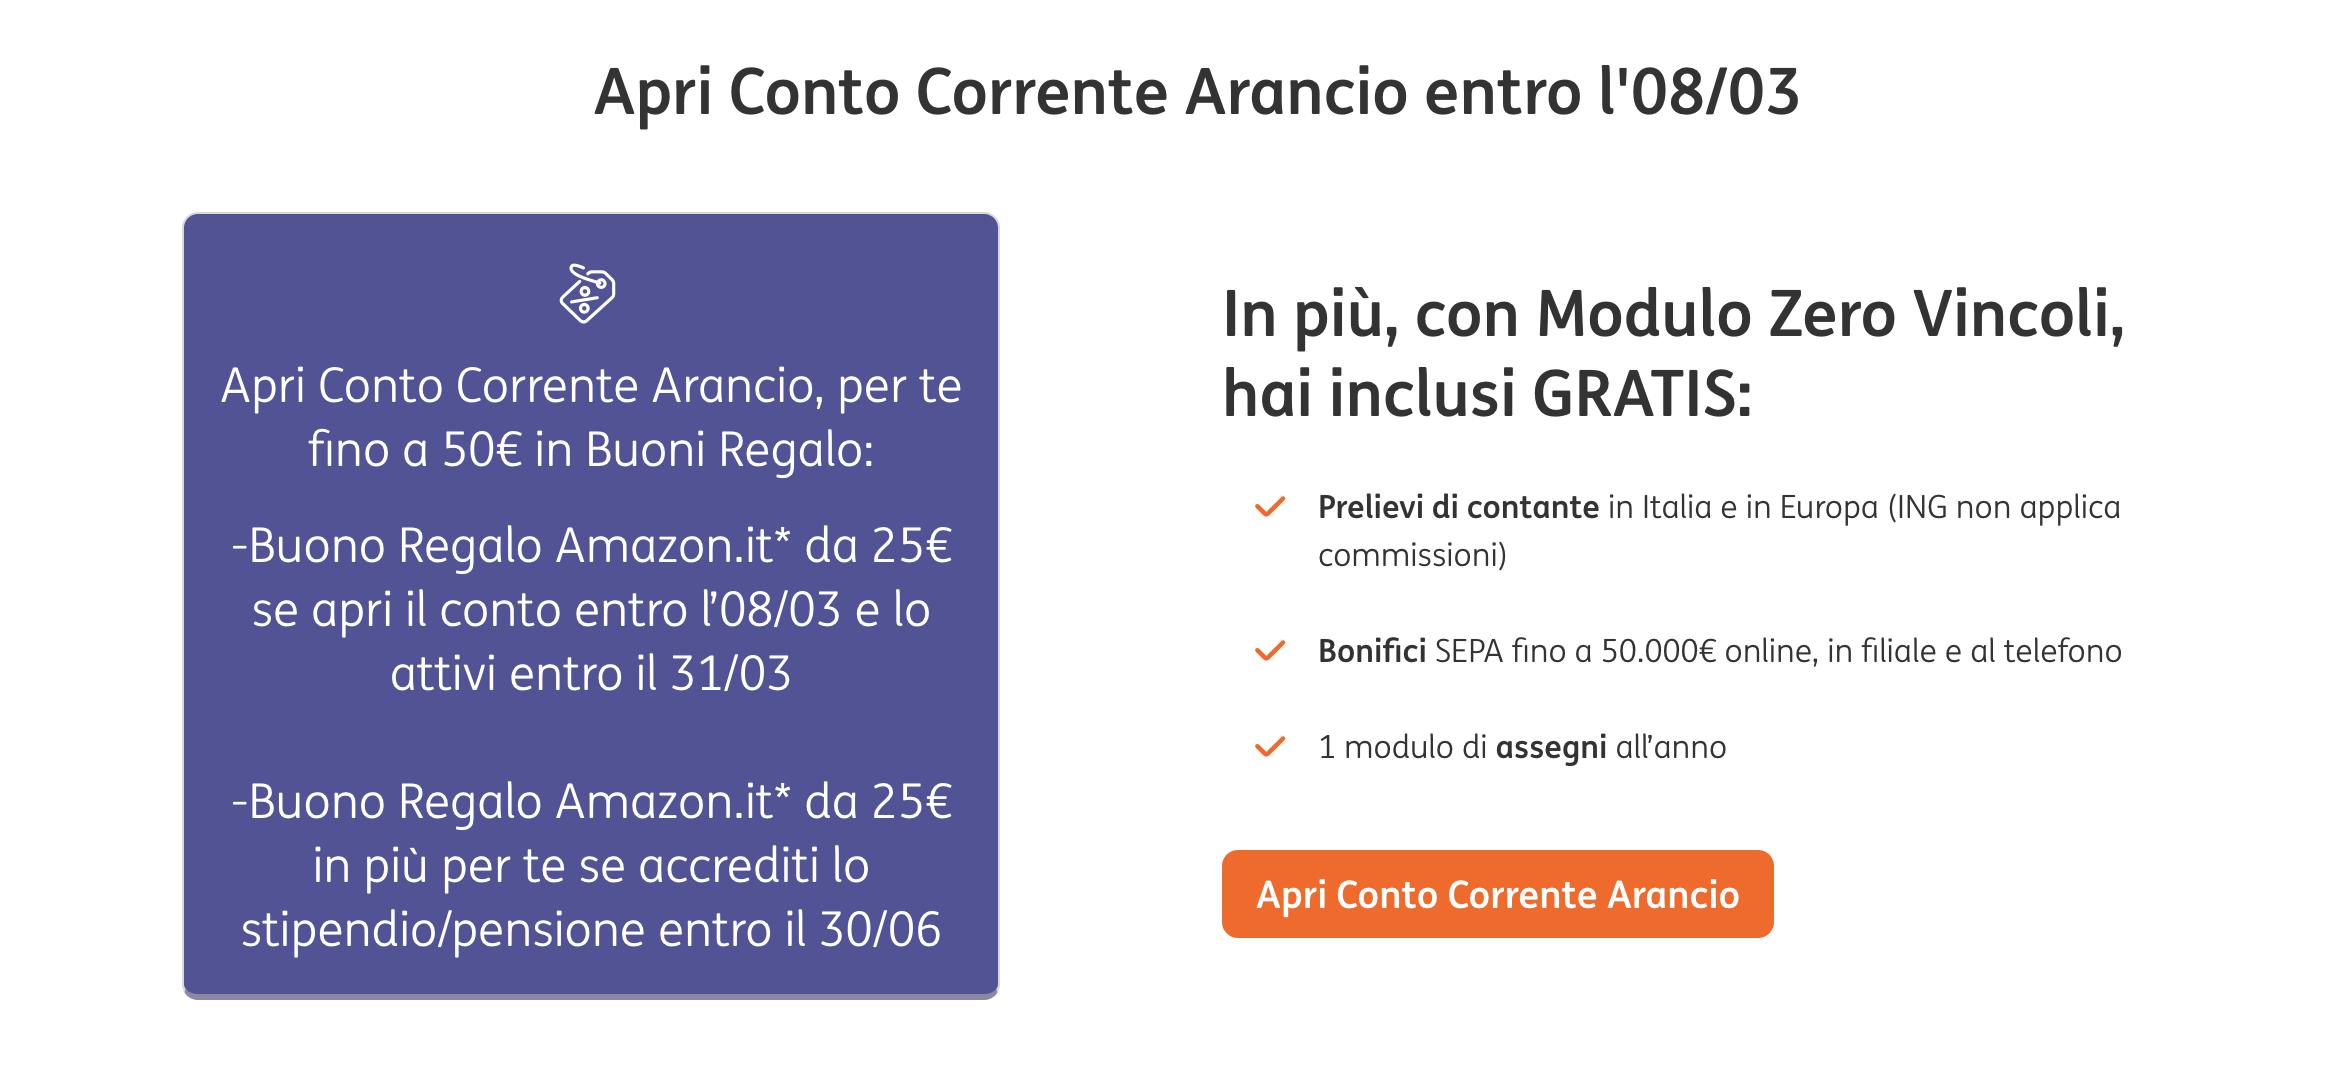 ING regala buoni Amazon fino a 50 euro aprendo gratis un Conto Corrente Arancio 1